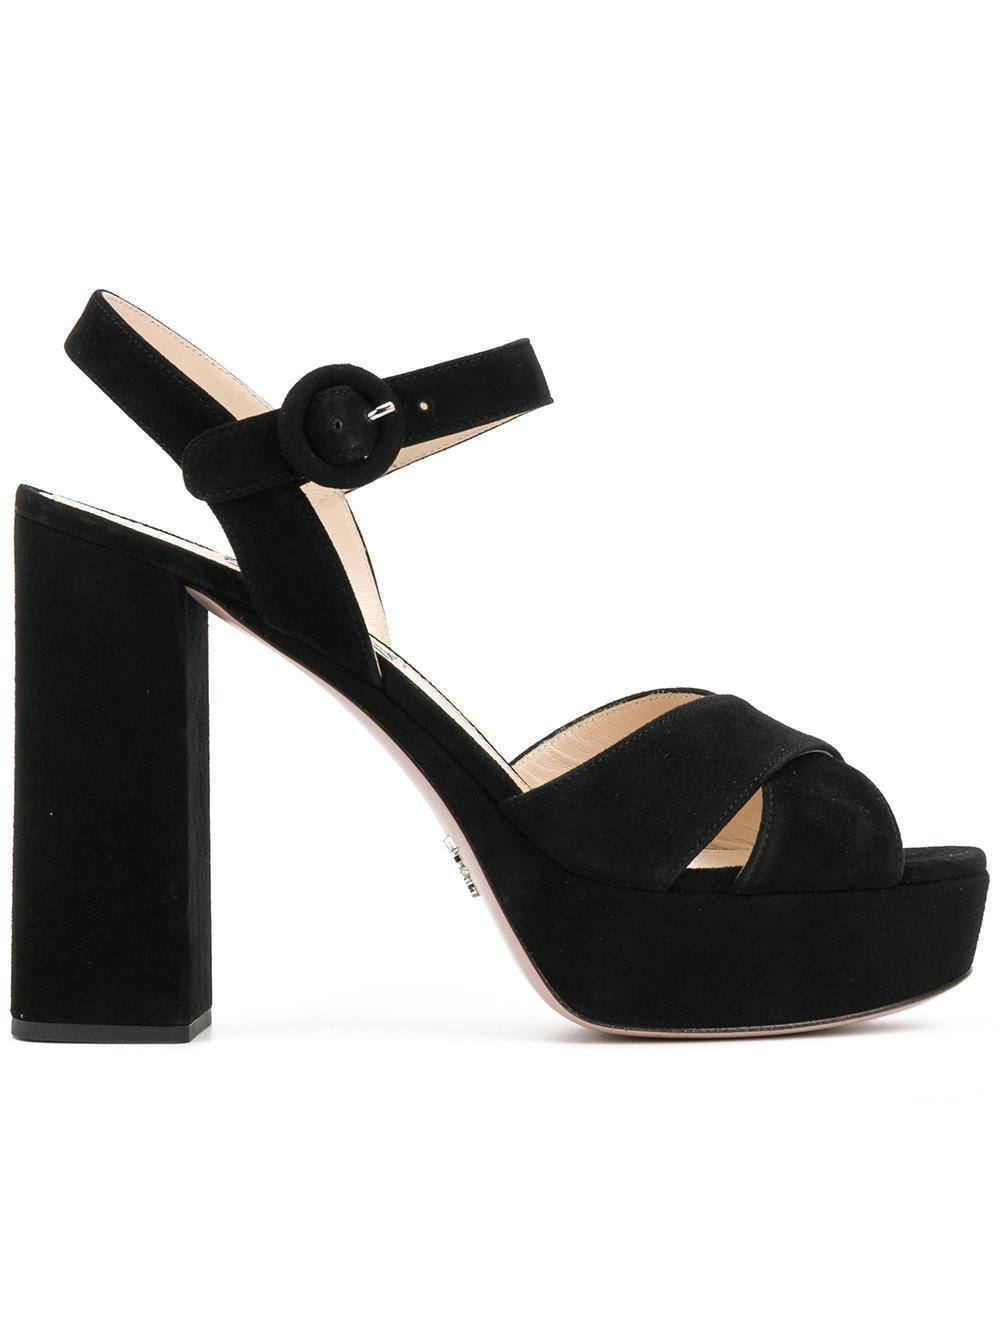 442177df9b2c Lyst - Prada Platform Sandals in Black for Men